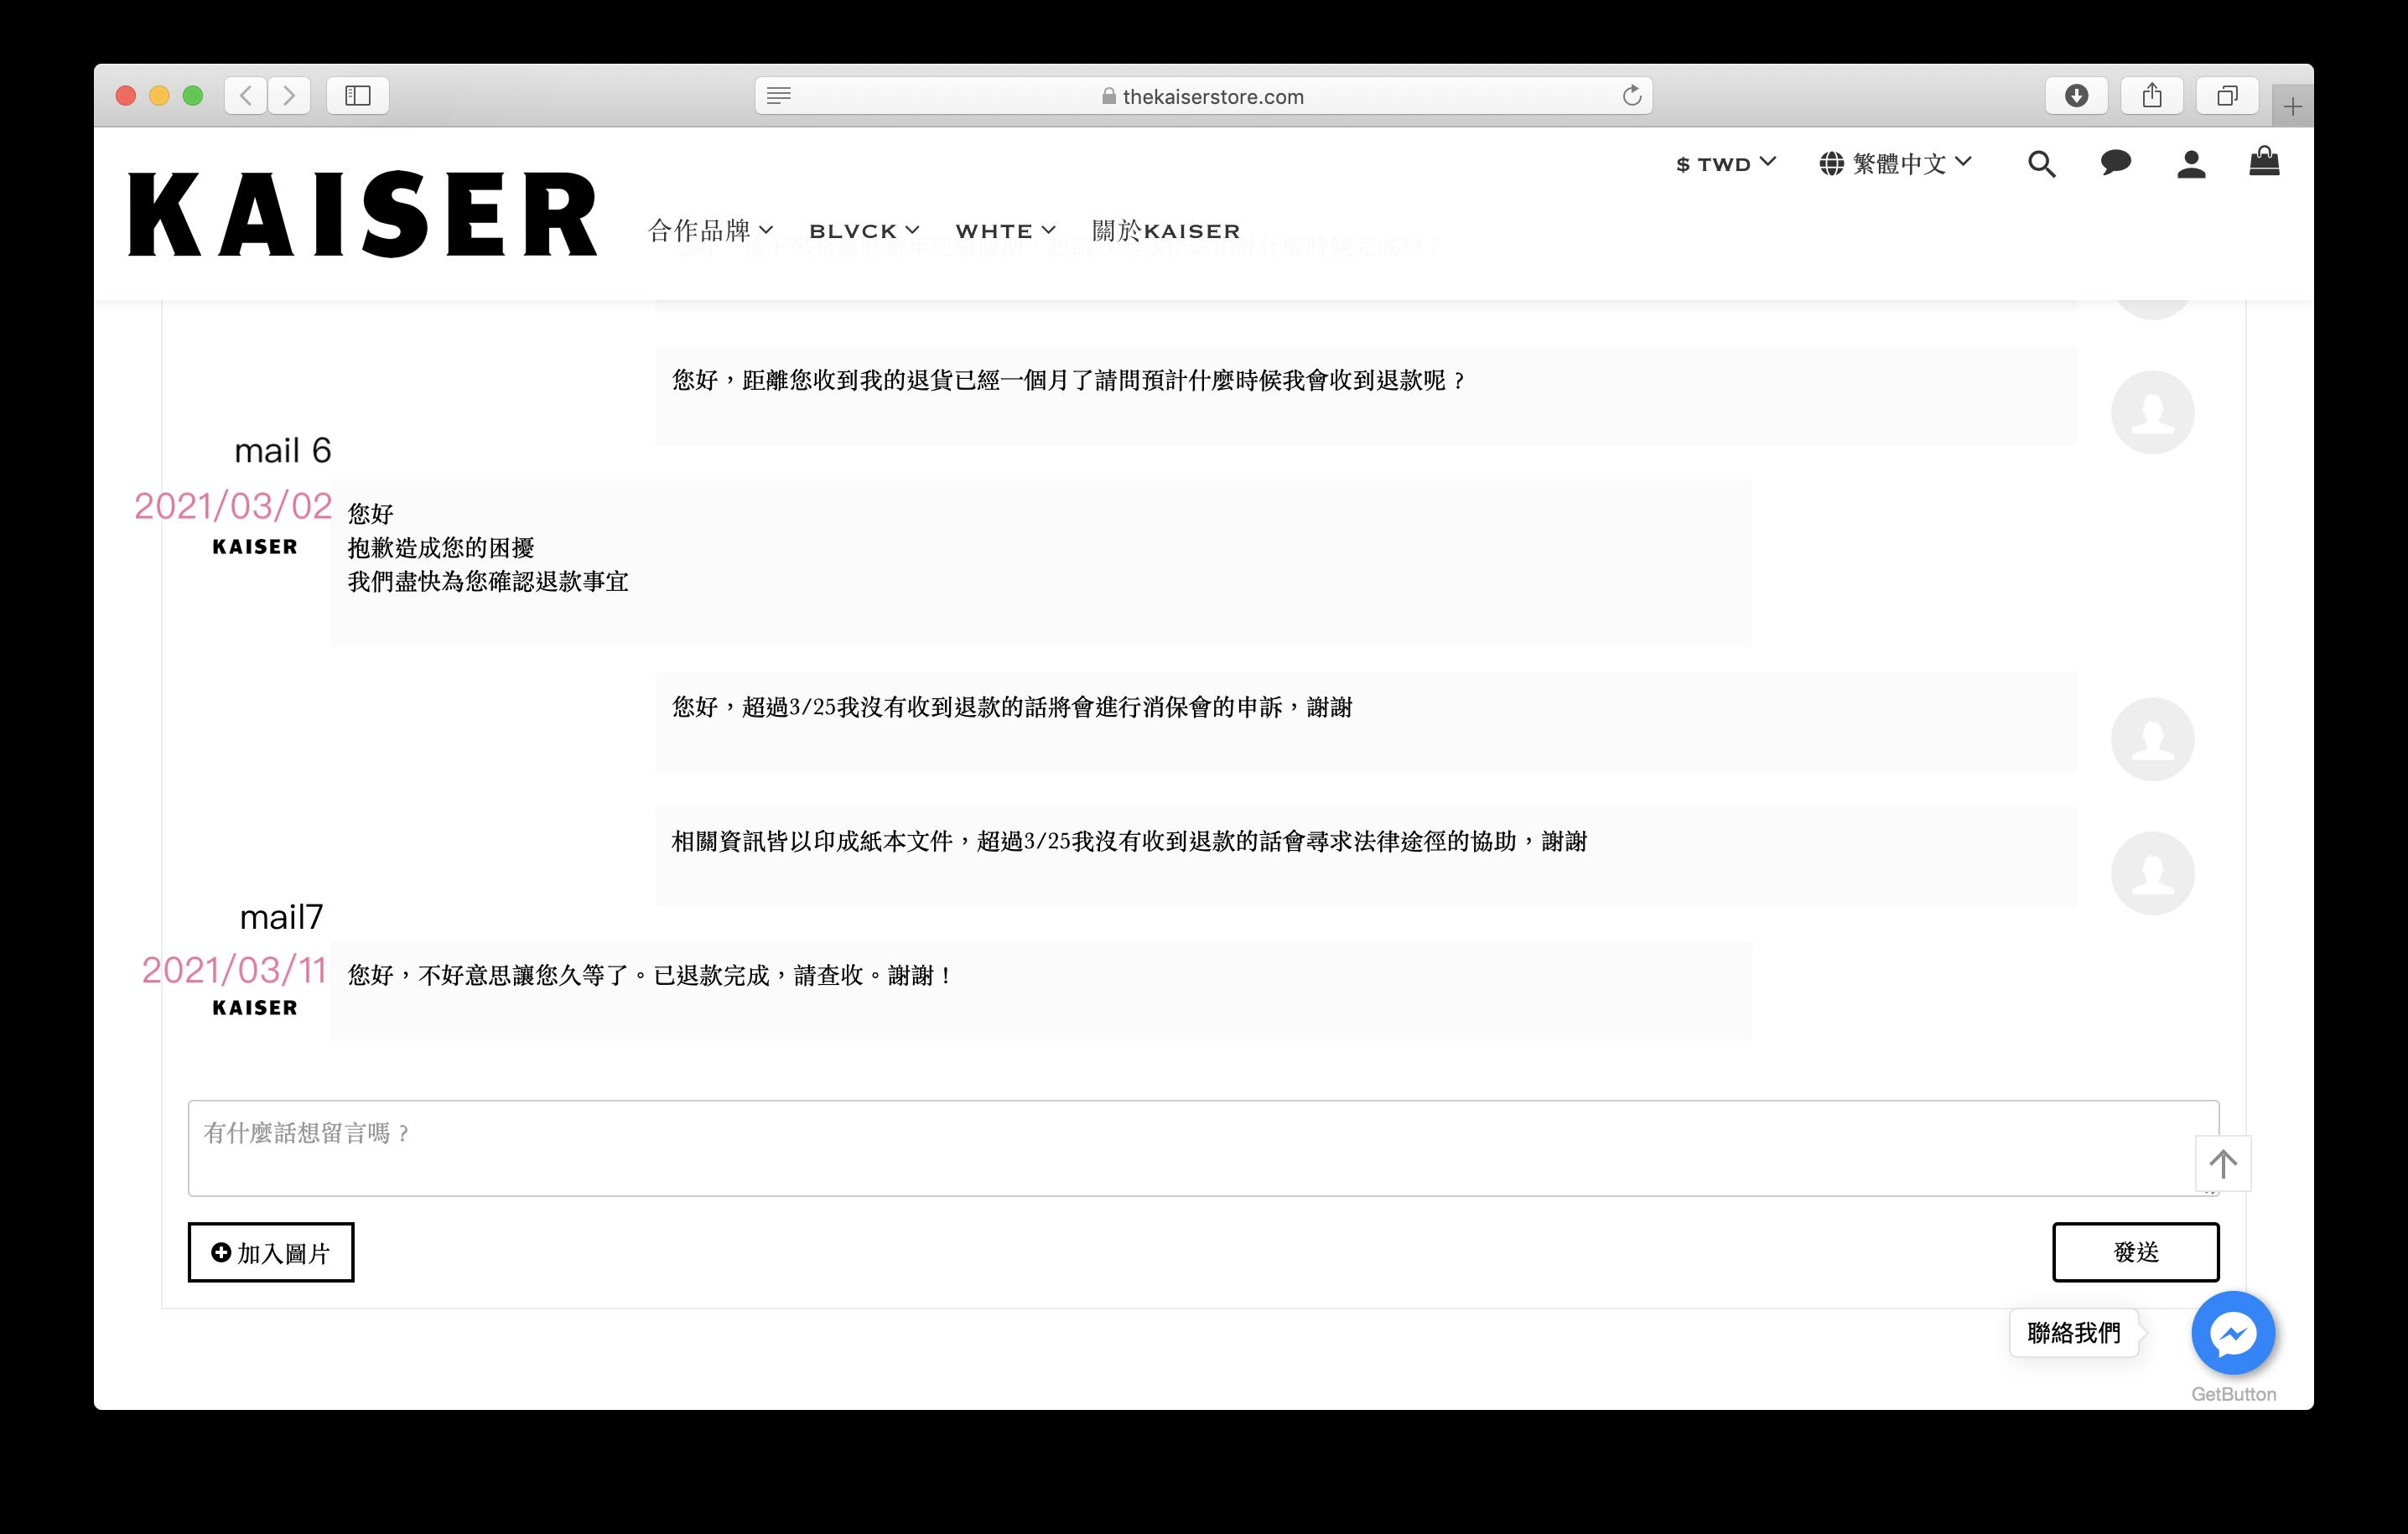 KAISER官網訂單對話6